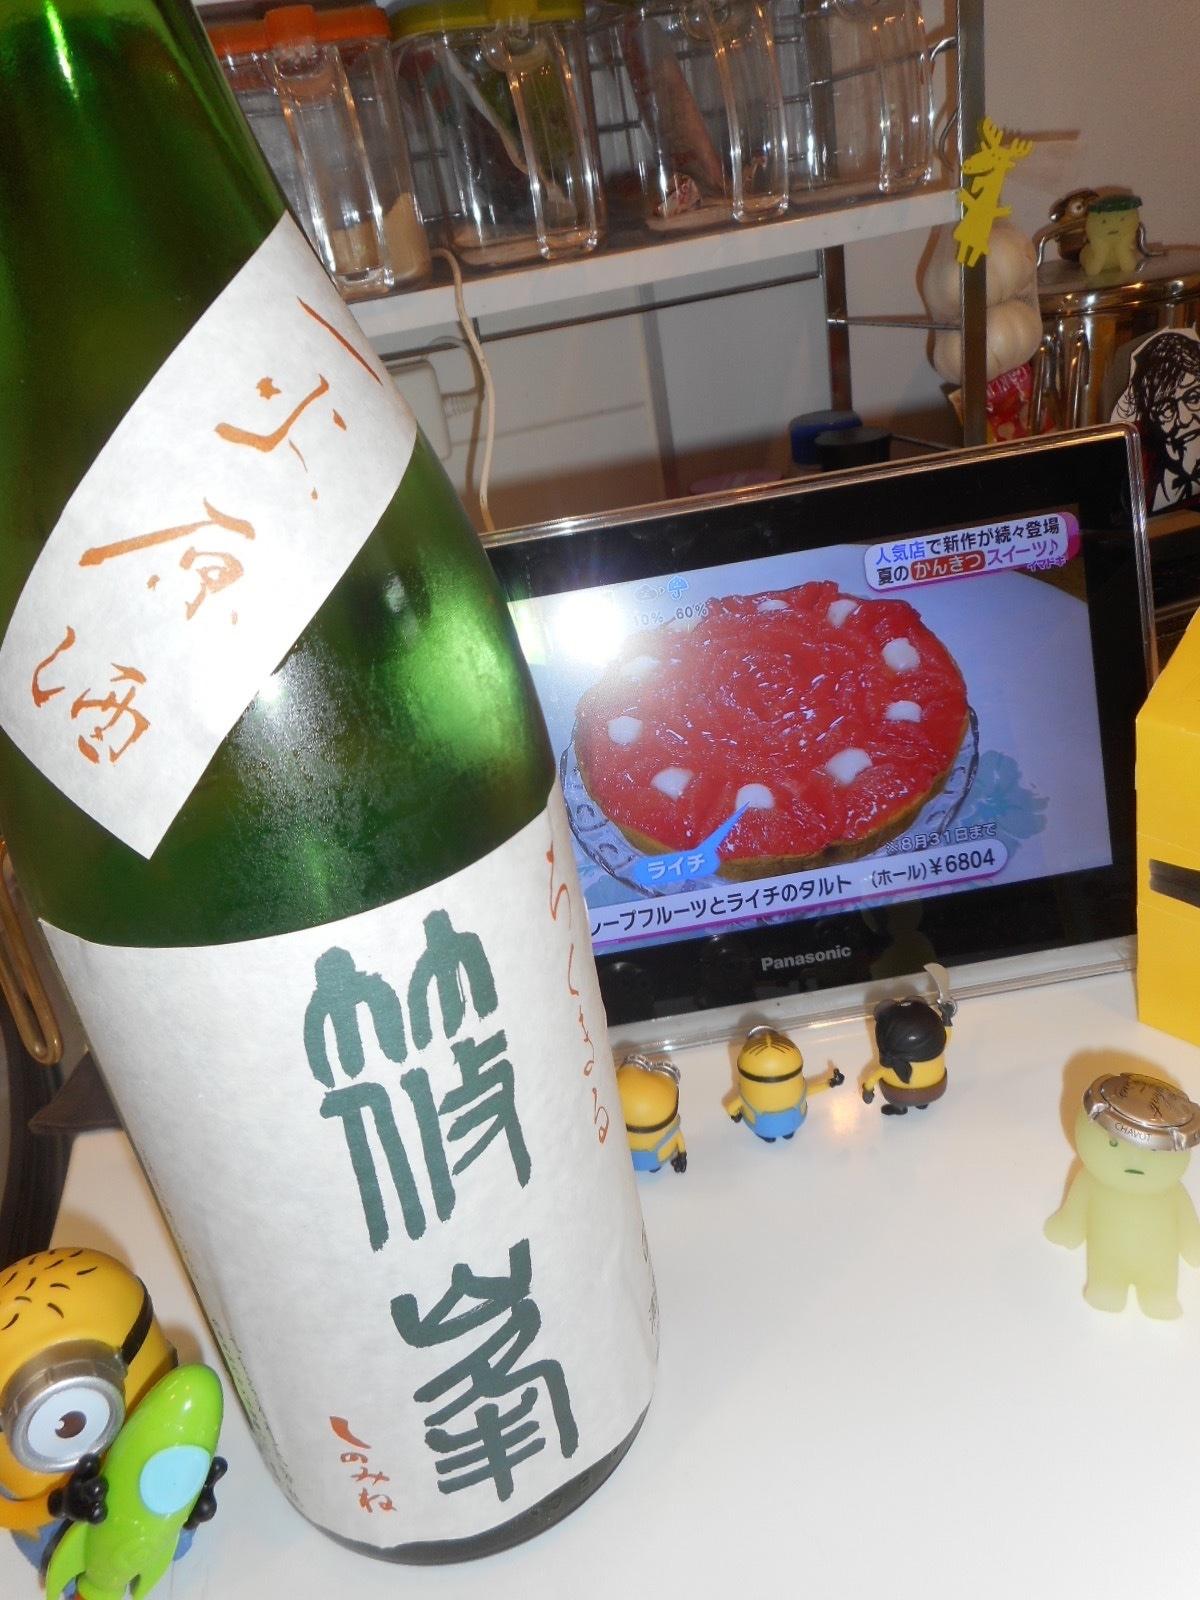 rokumaru_hattan_hiire26by3.jpg